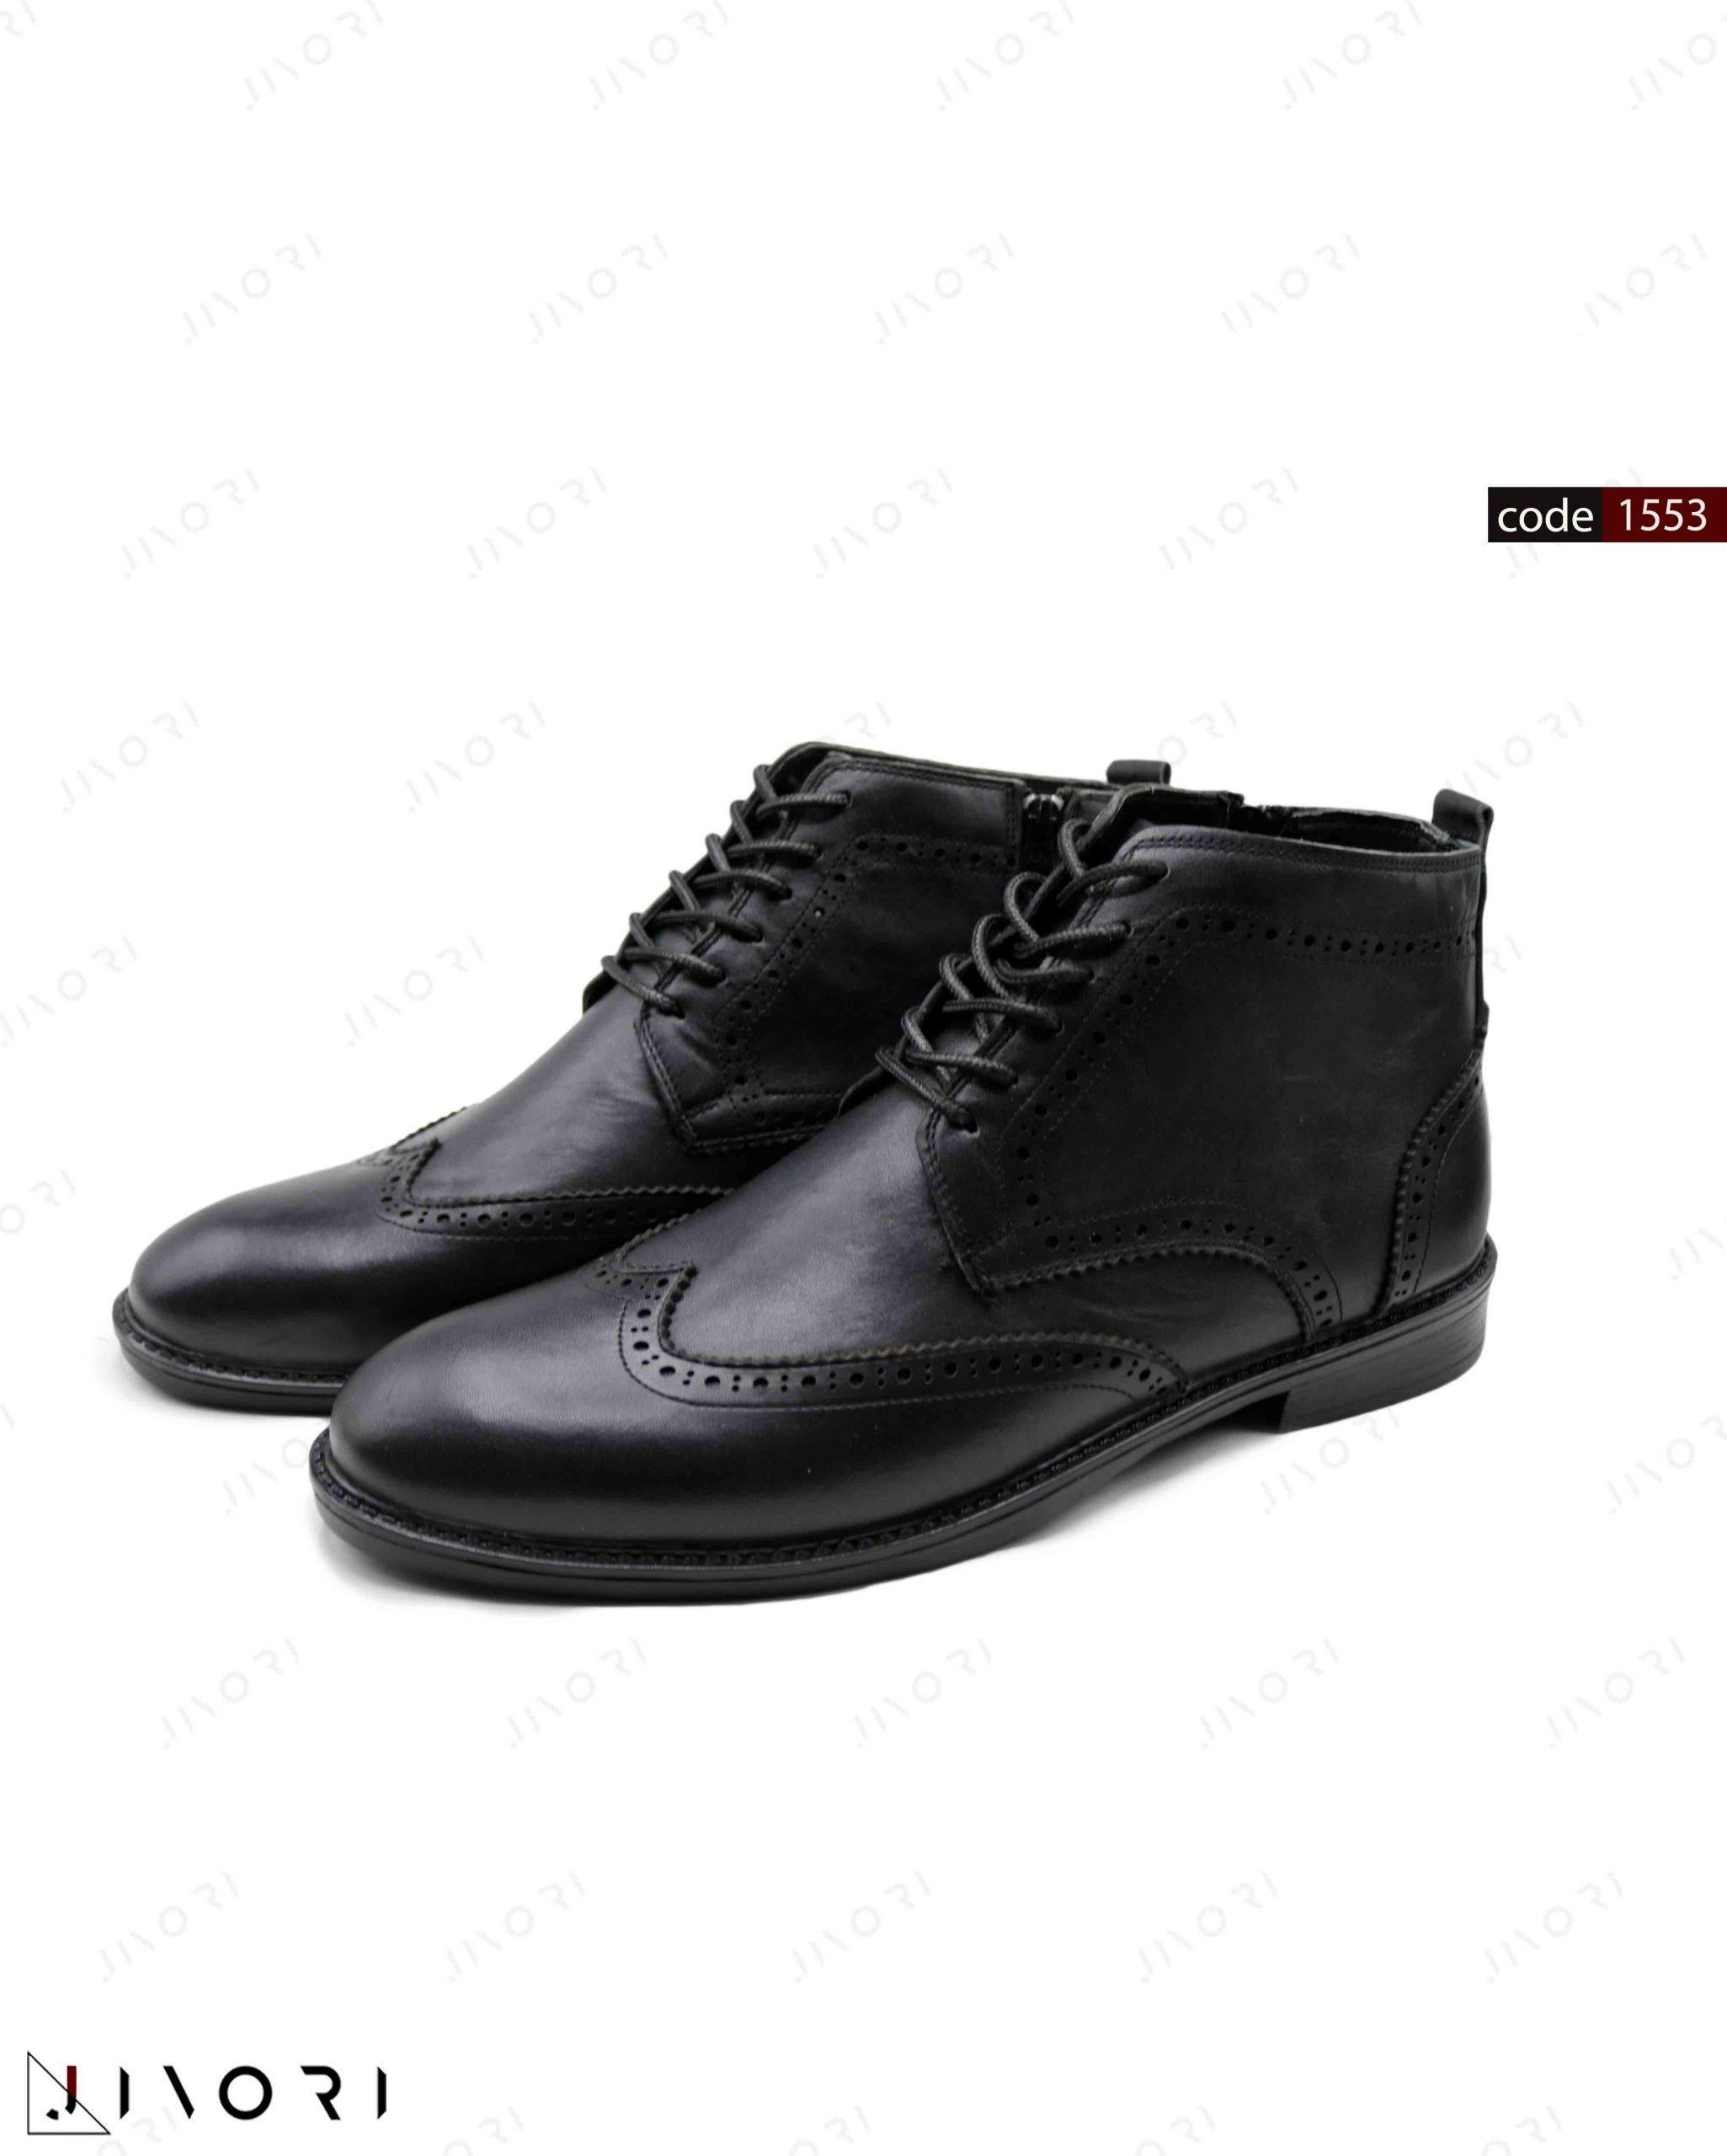 کفش هشترک (1553)